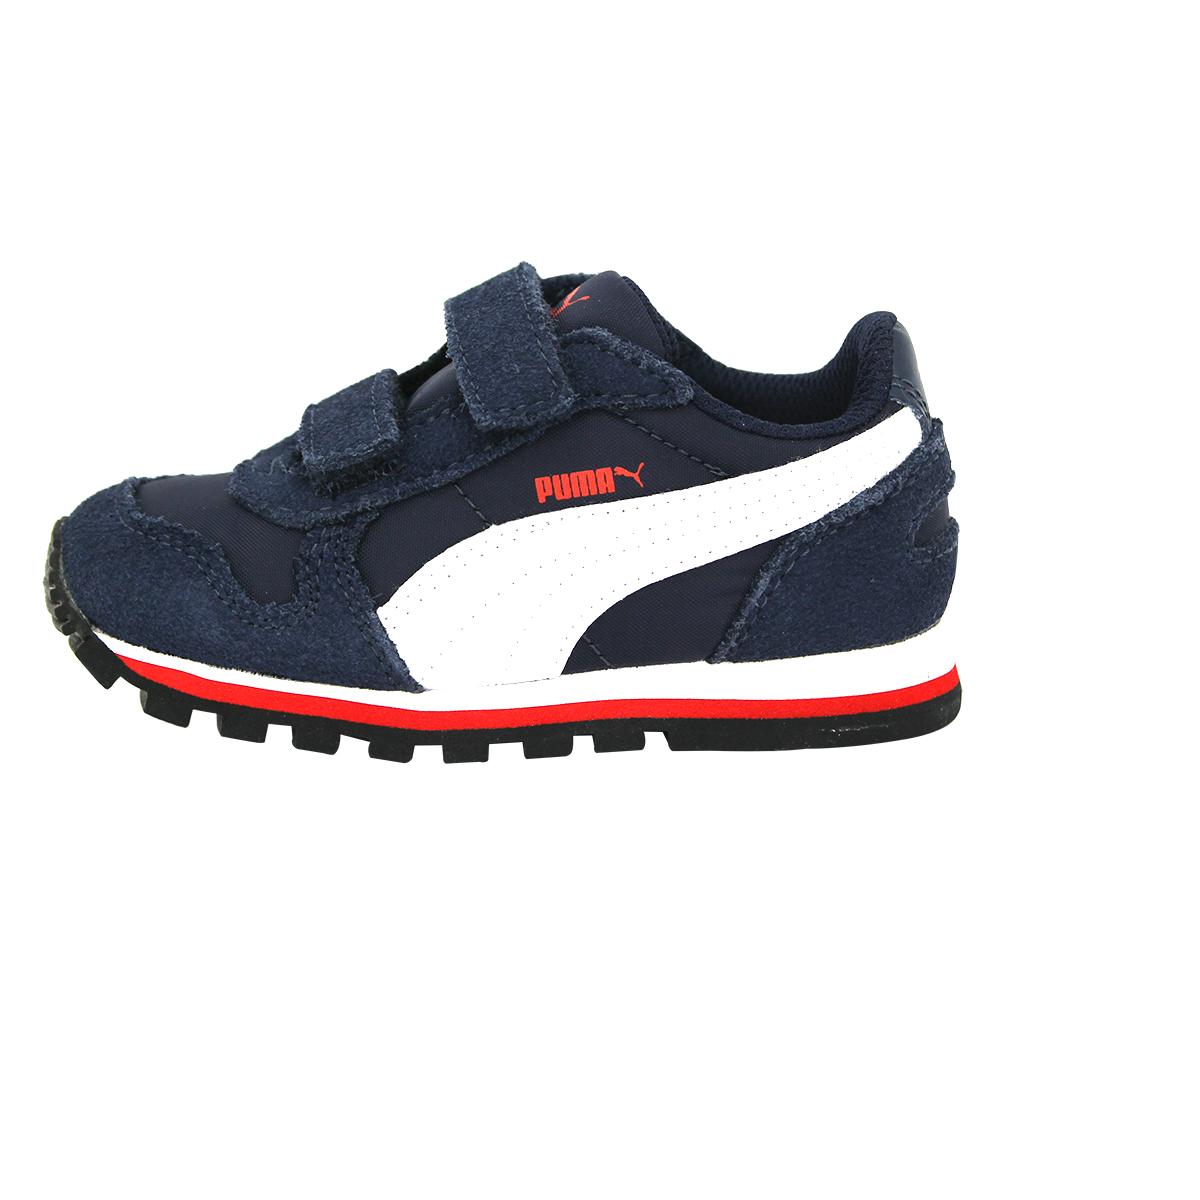 PUMA KIDS ST RUNNER Blau Kinder Sneakers Schuhe Neu